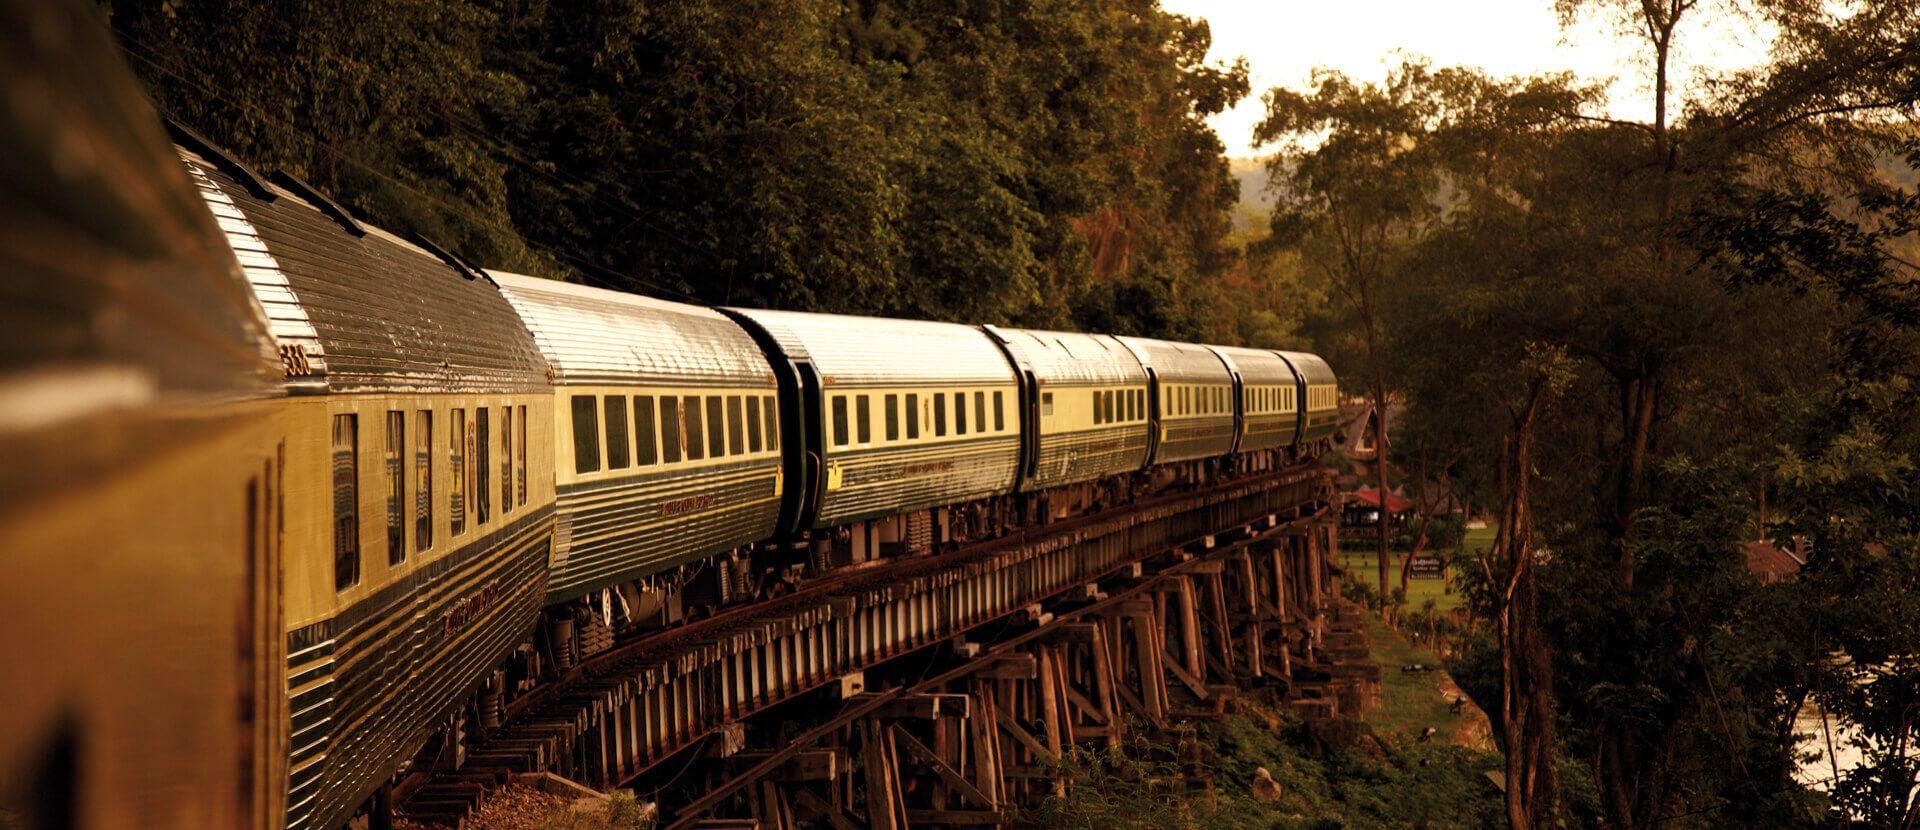 Belmond Eastern and Oriental Express